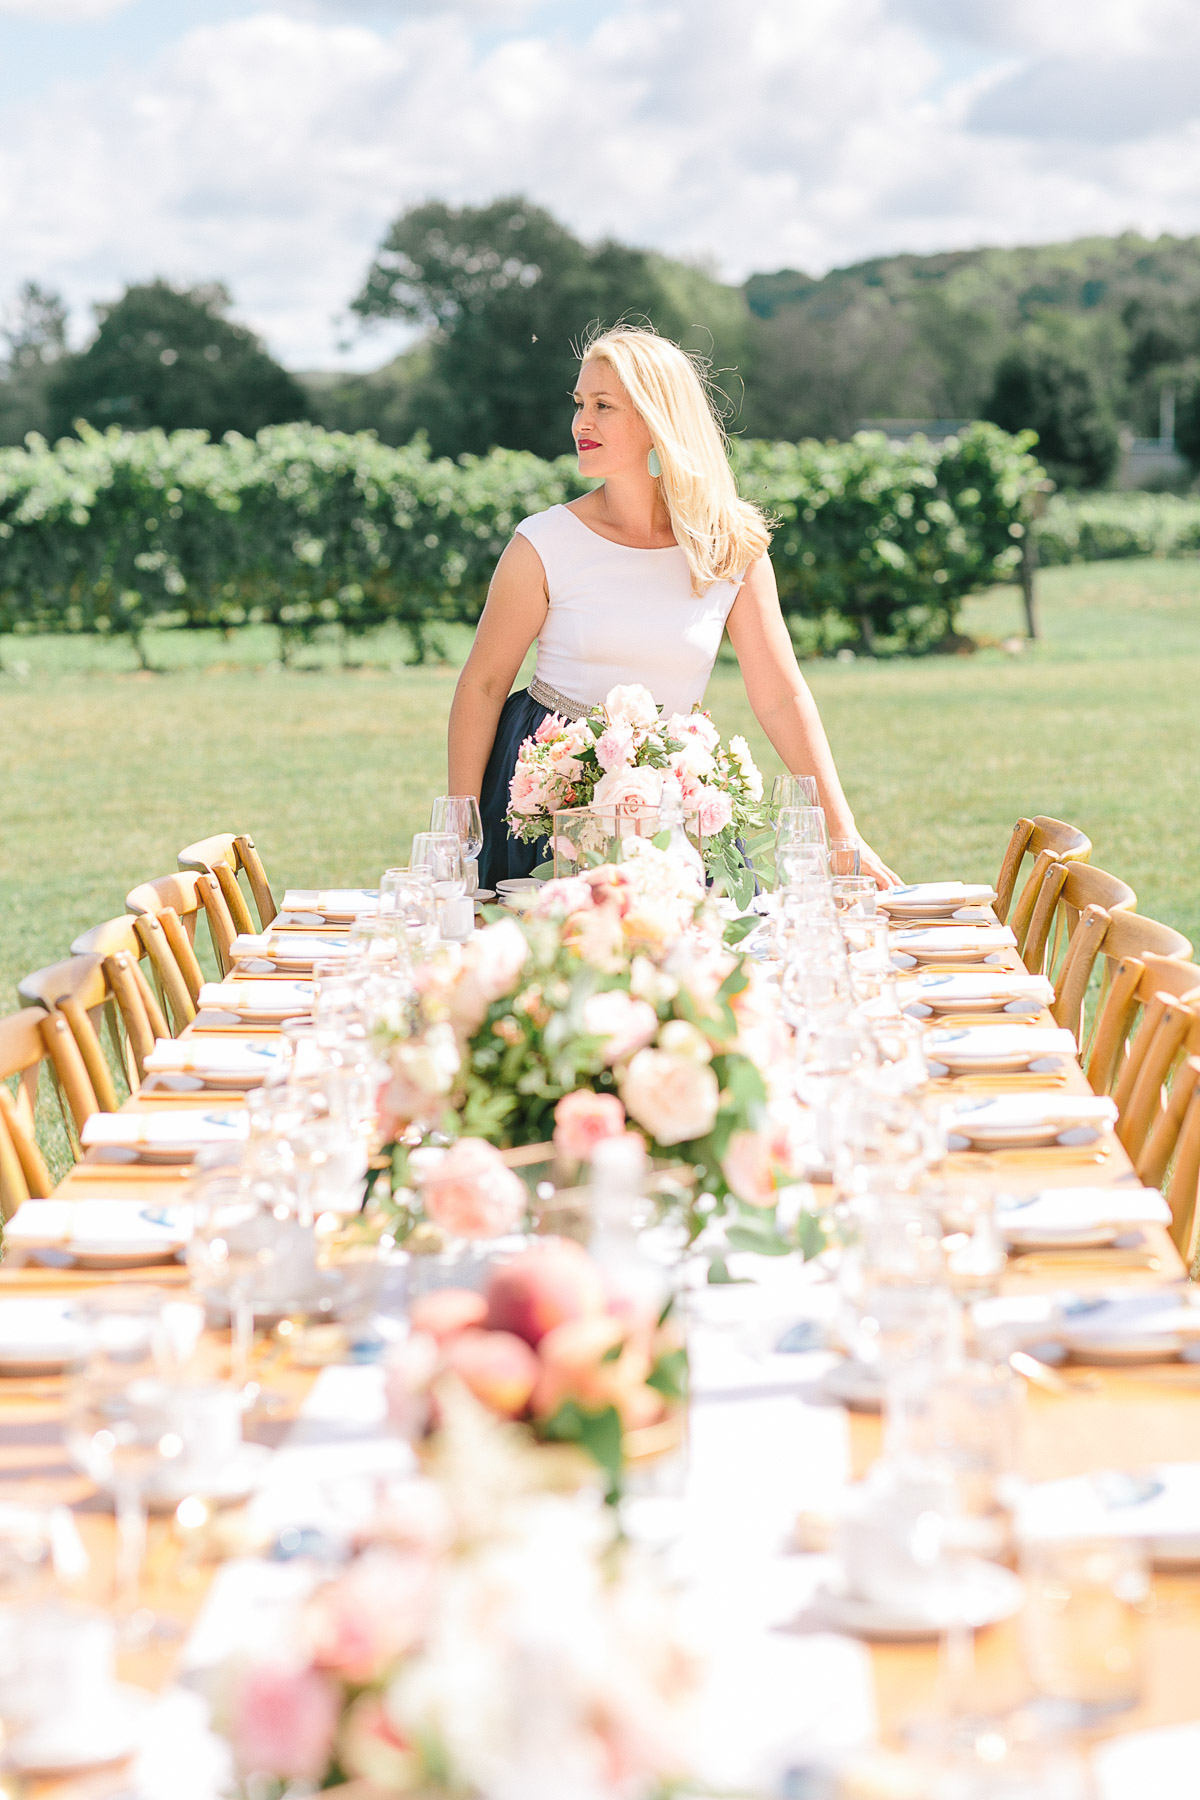 tamara-lockwood-photography-vineyard-bride-swish-list-ravine-vineyard-niagara-on-the-lake-editorial-37.jpg